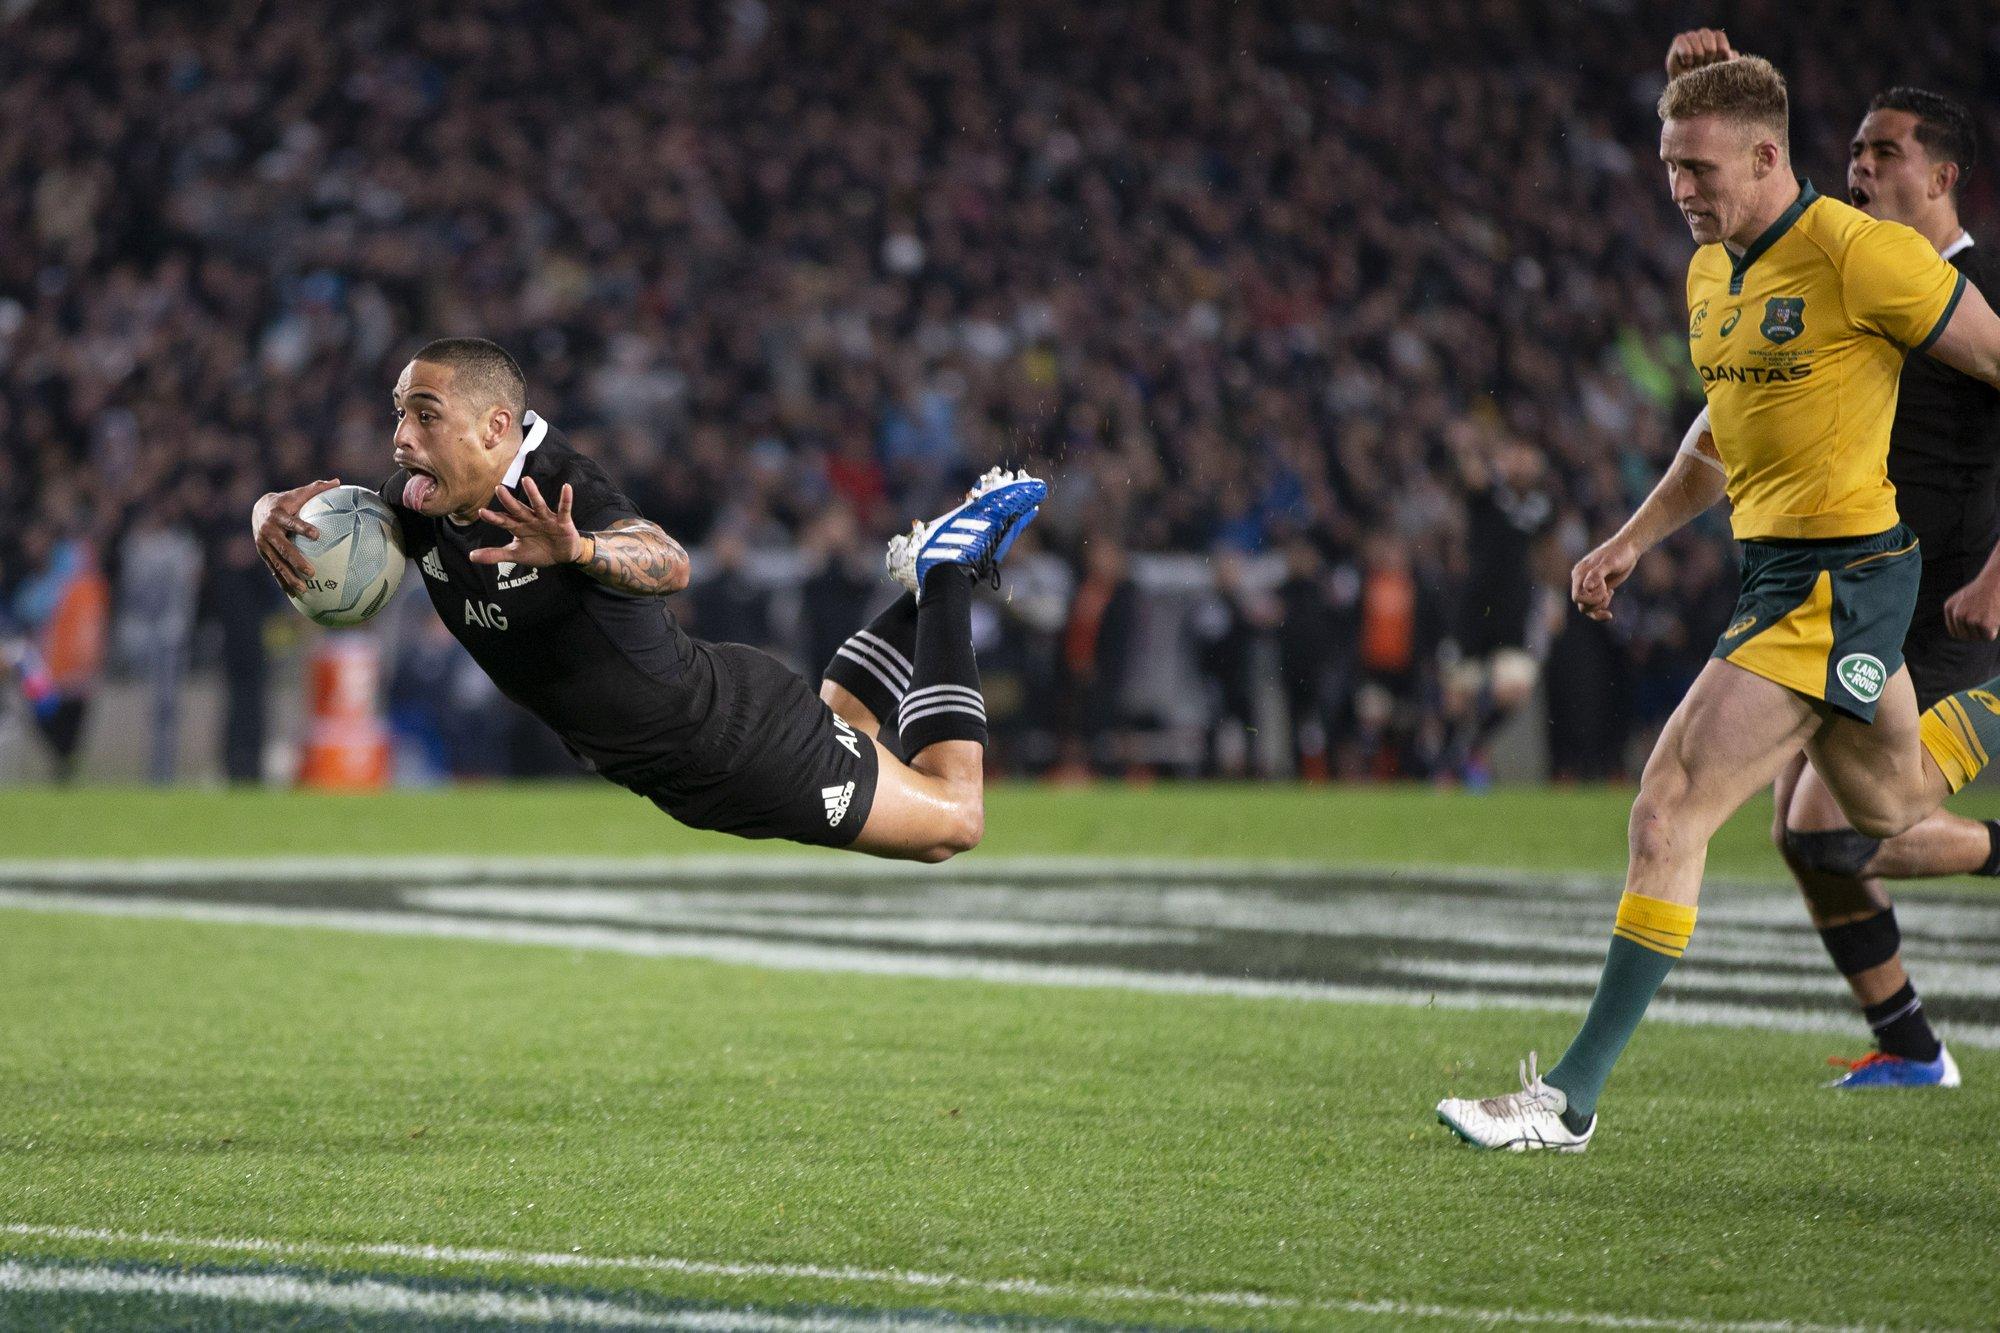 New Zealand thrashes Australia 36-0 to retain Bledisloe Cup